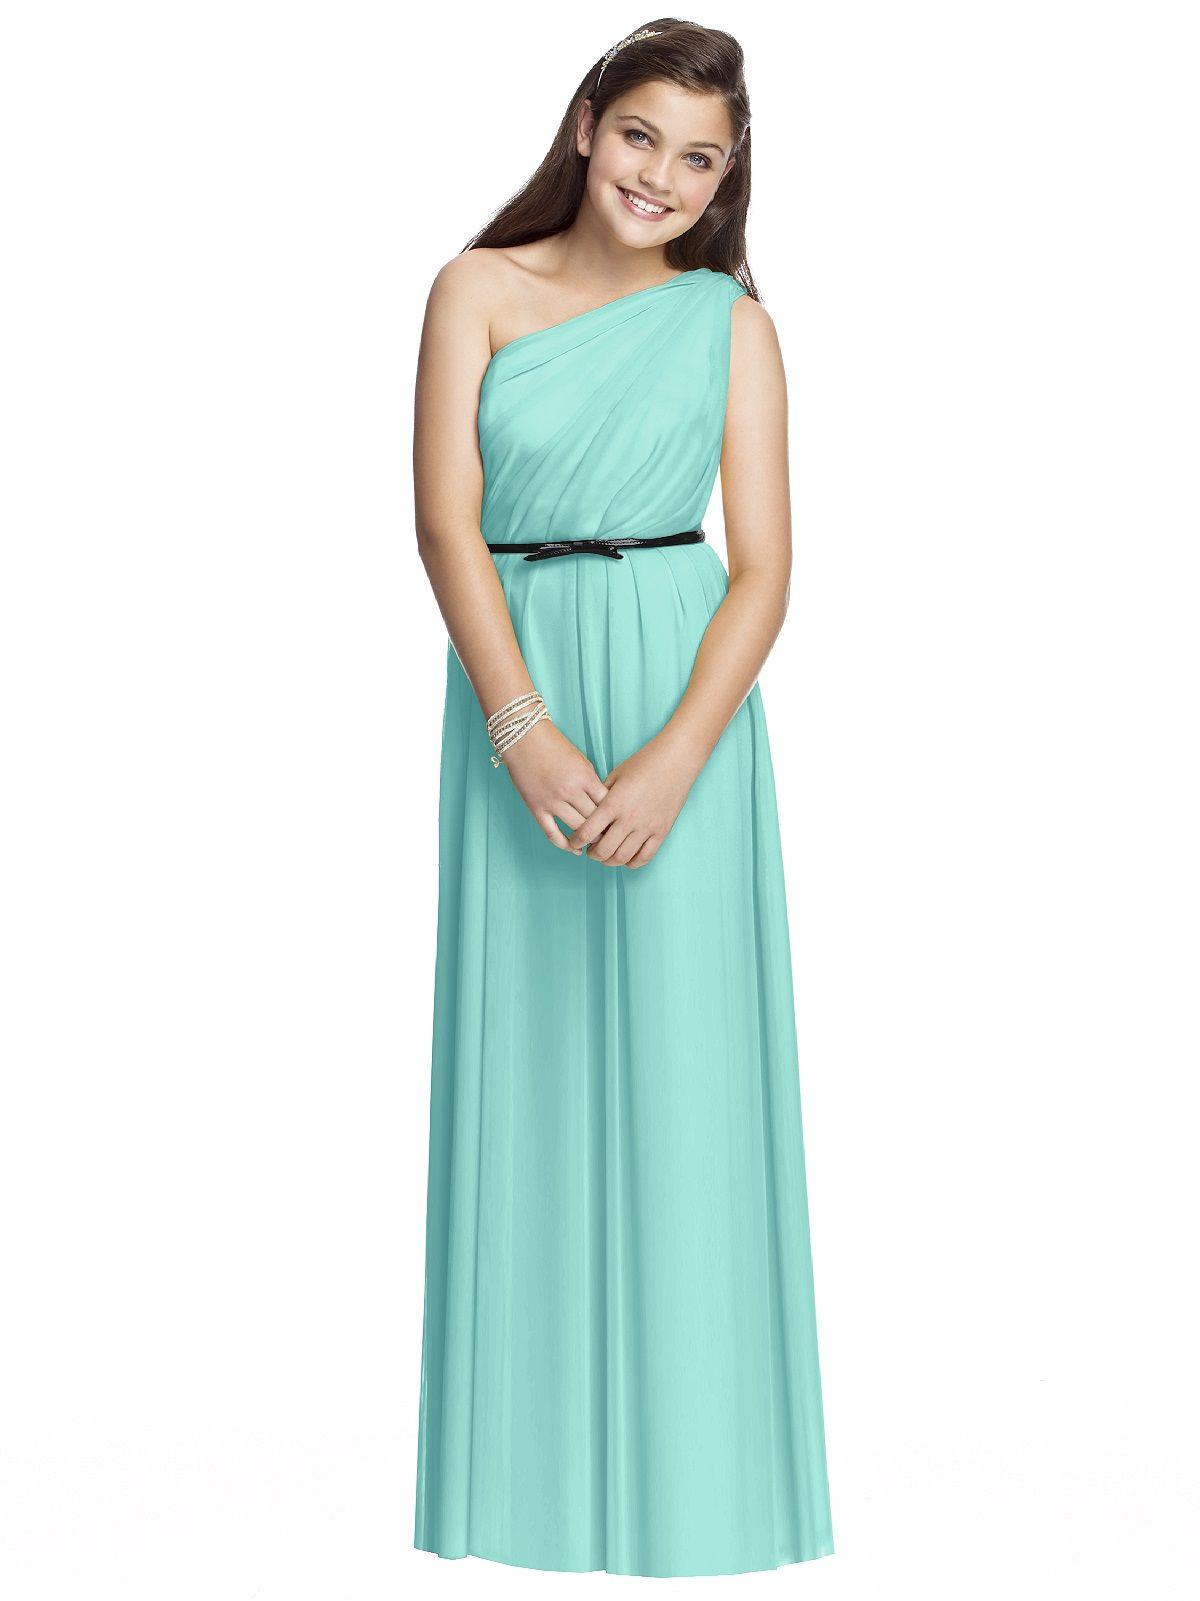 Junior bridesmaid dresses girl dresses pinterest alfred sung alfred sung junior bridesmaid dresses ombrellifo Gallery